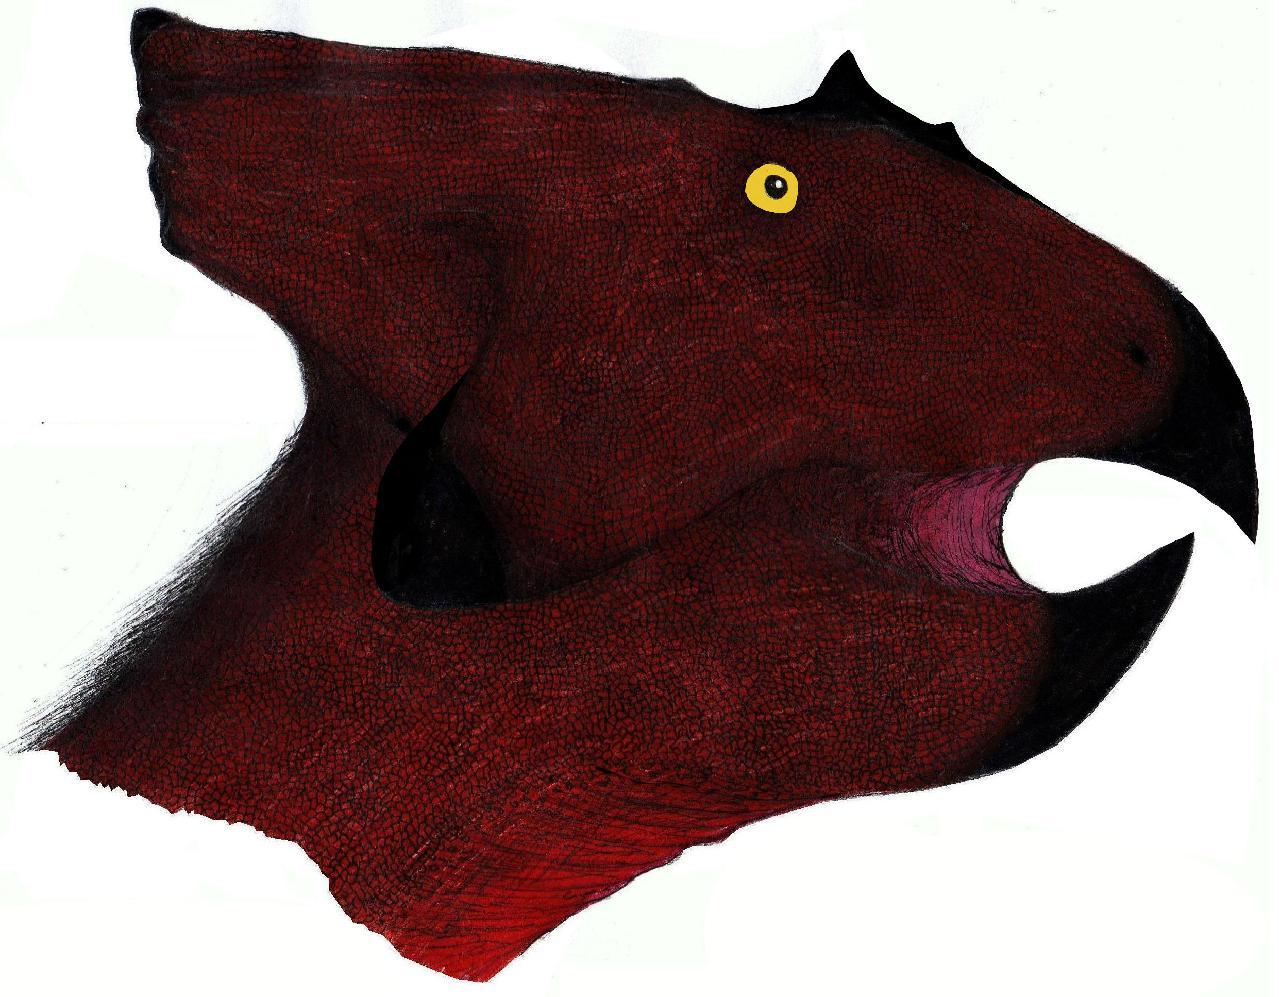 Breviceratops